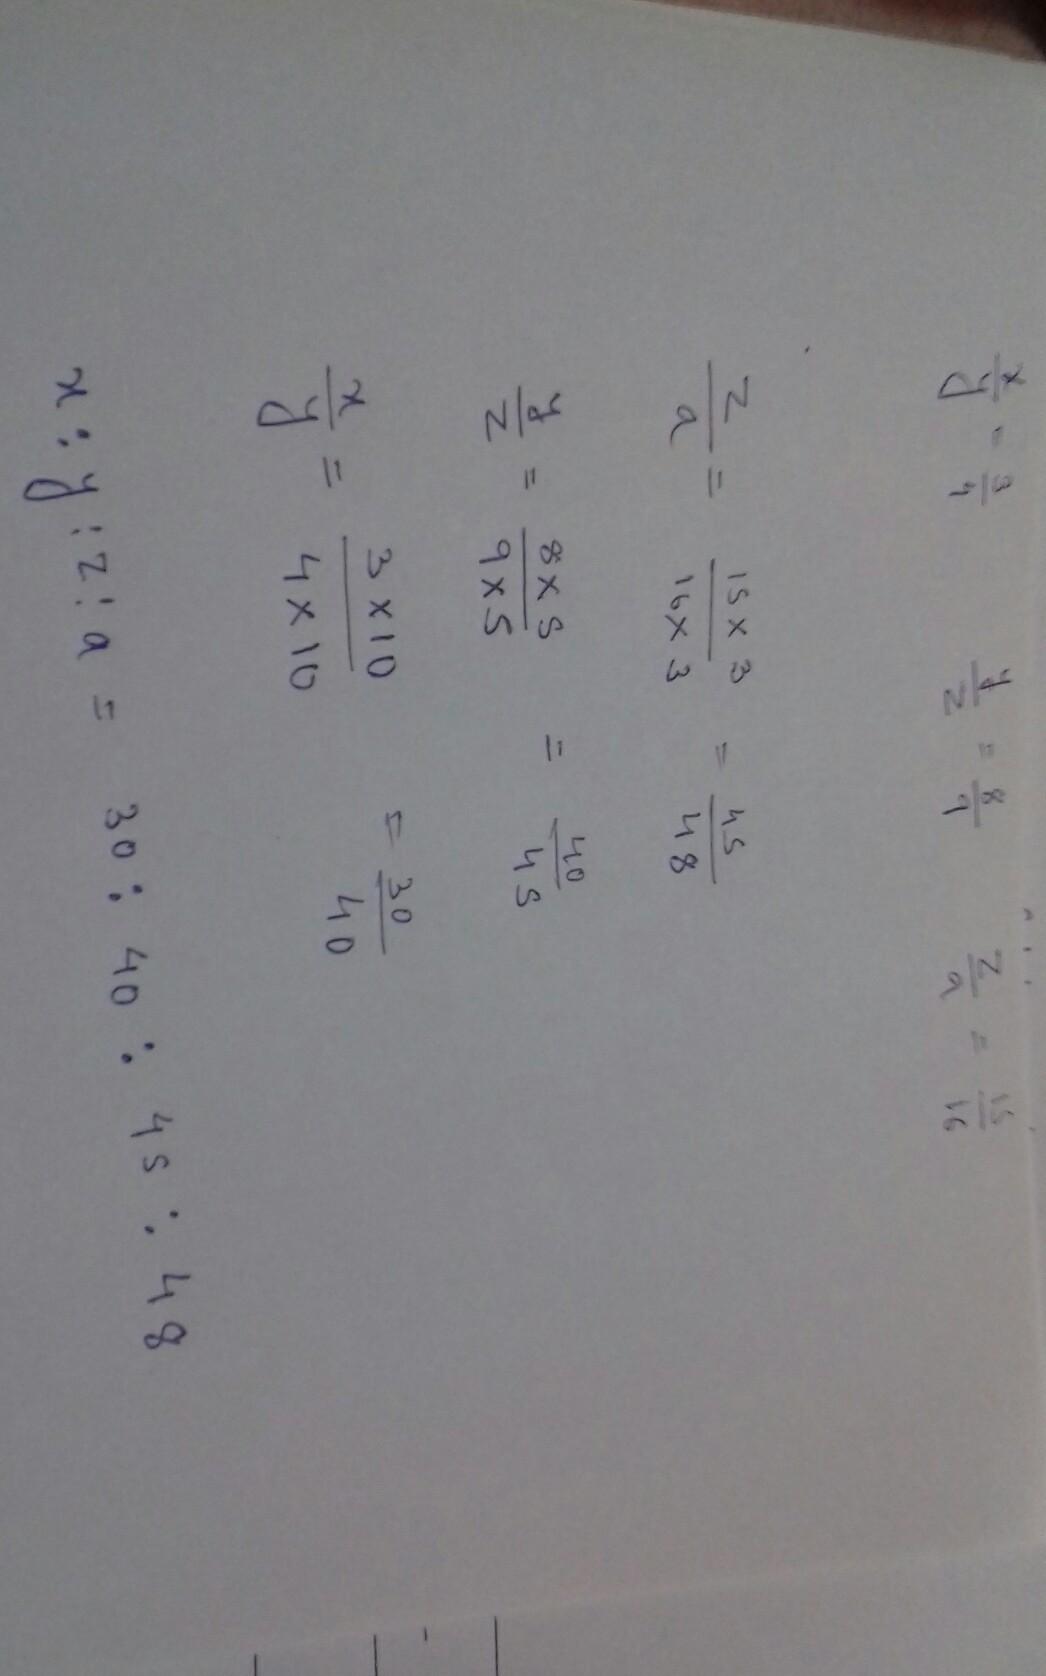 If x:y = 3:4 and y:z = 8:9, z:a is 15:16, find x:y:z:a